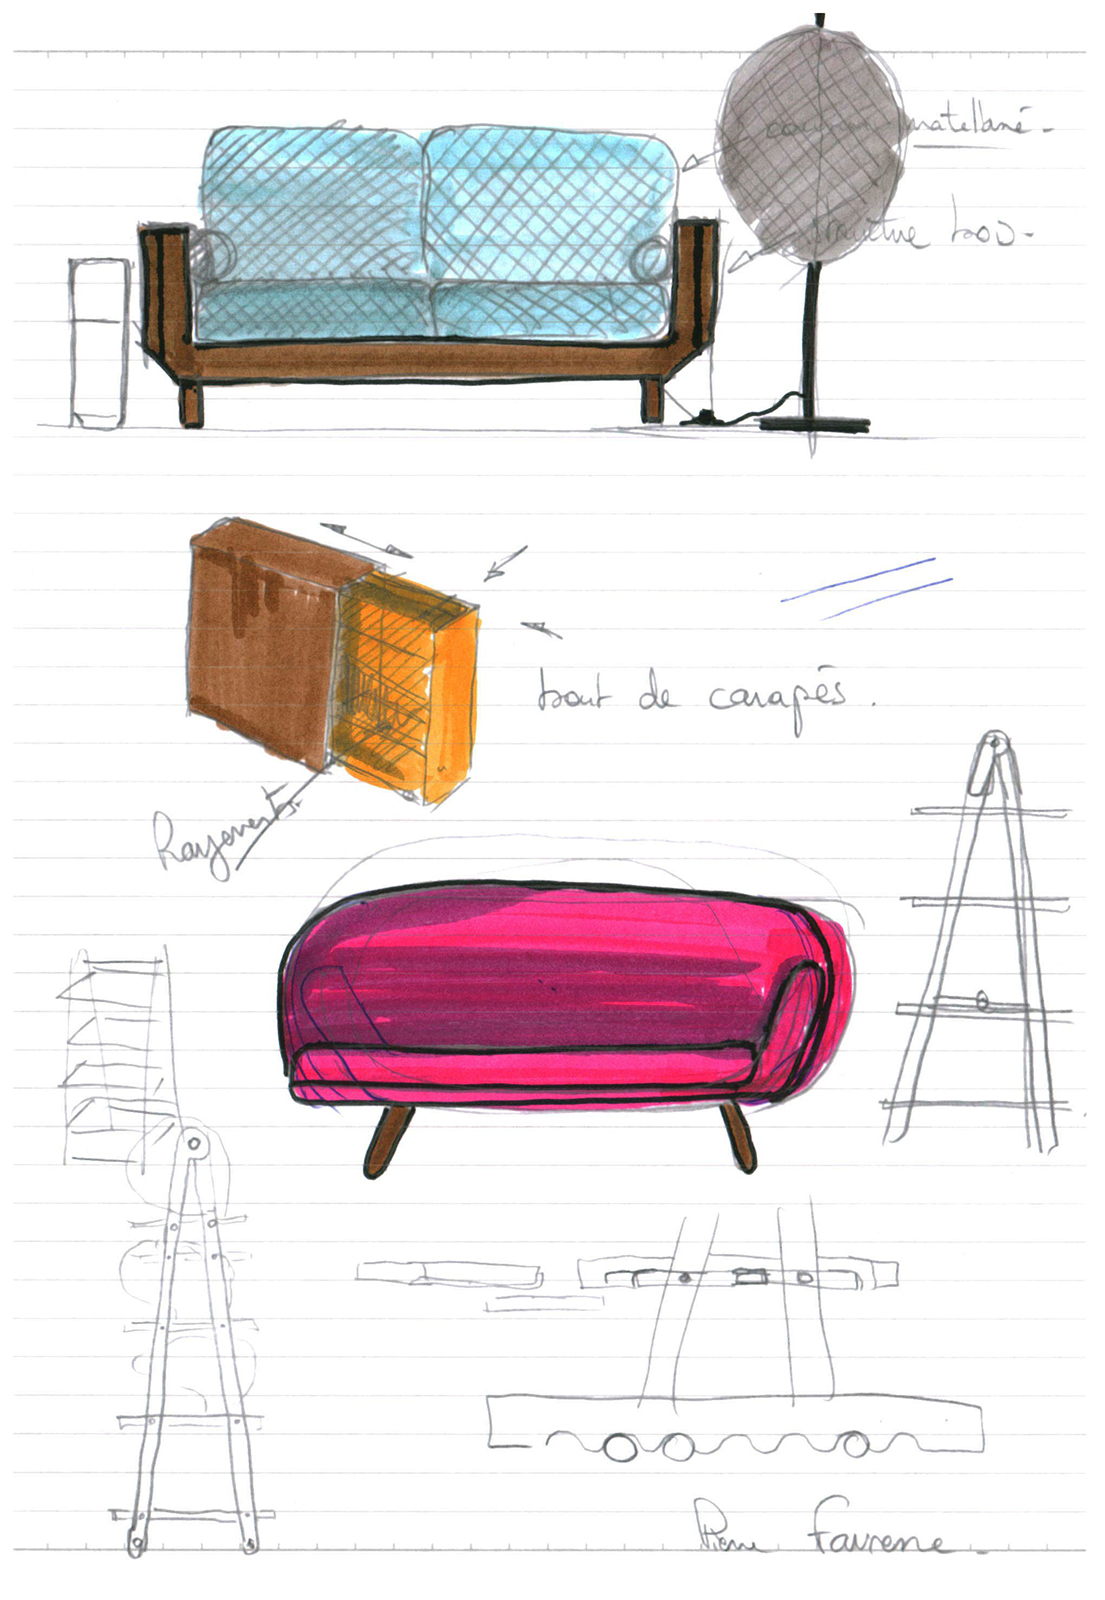 Pierre Favresse - Drawing - Work - Designer - Design - Preparatory sketch n°9